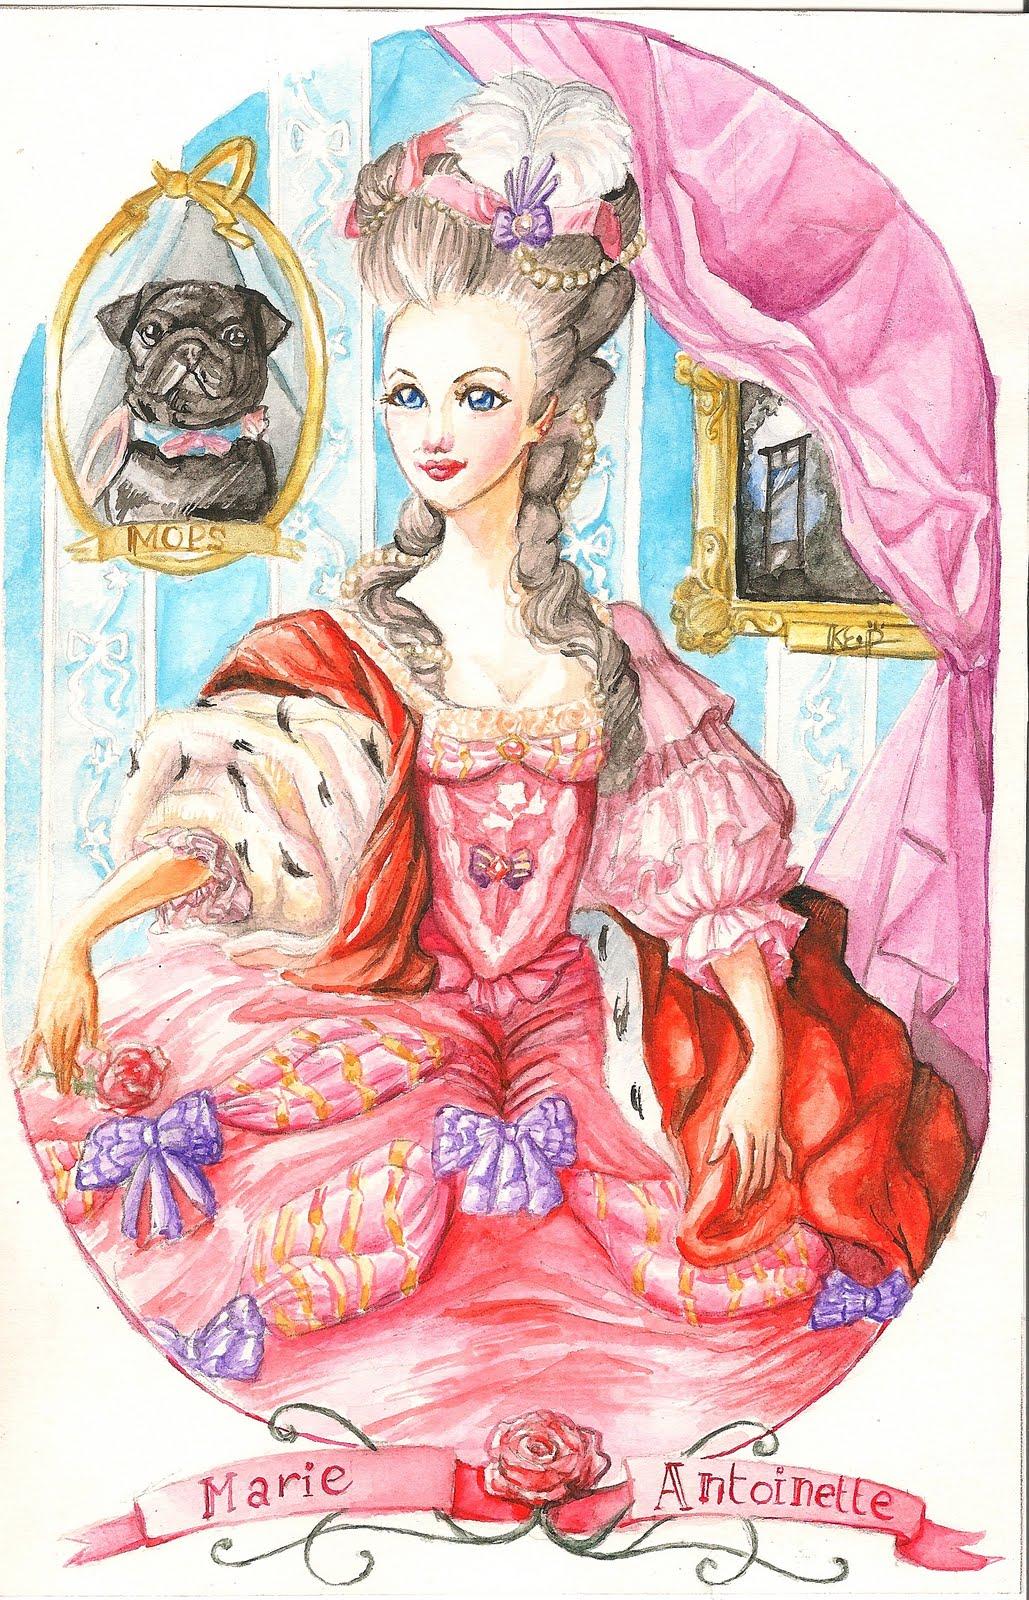 http://2.bp.blogspot.com/_JLL963kbcPE/TVEnsR2FvwI/AAAAAAAAAXM/tKuIxW4Um5E/s1600/Marie-Antoinette.jpg